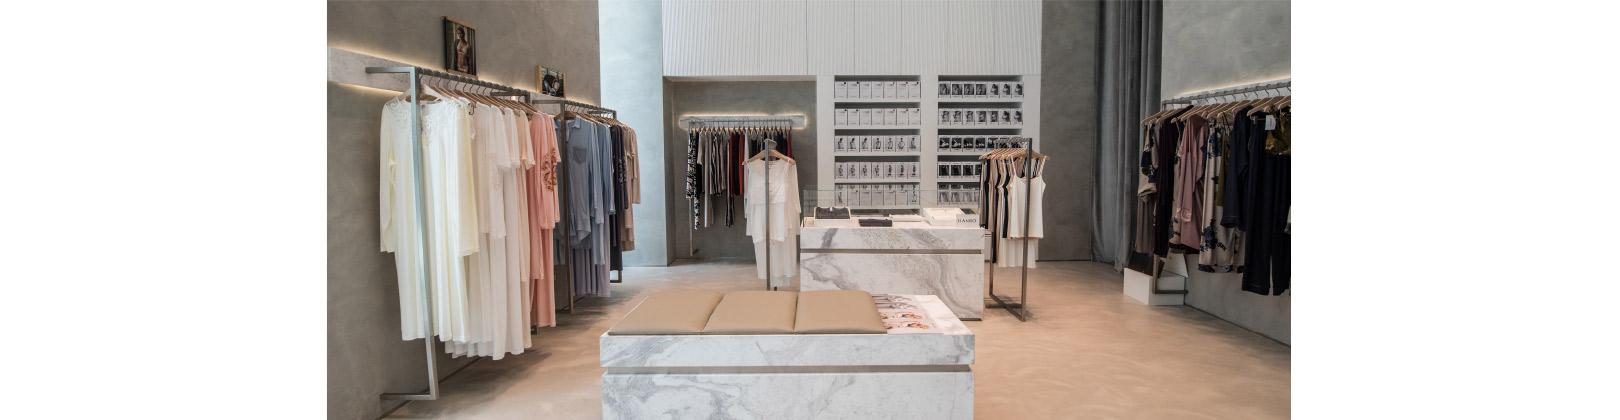 Dubai Store